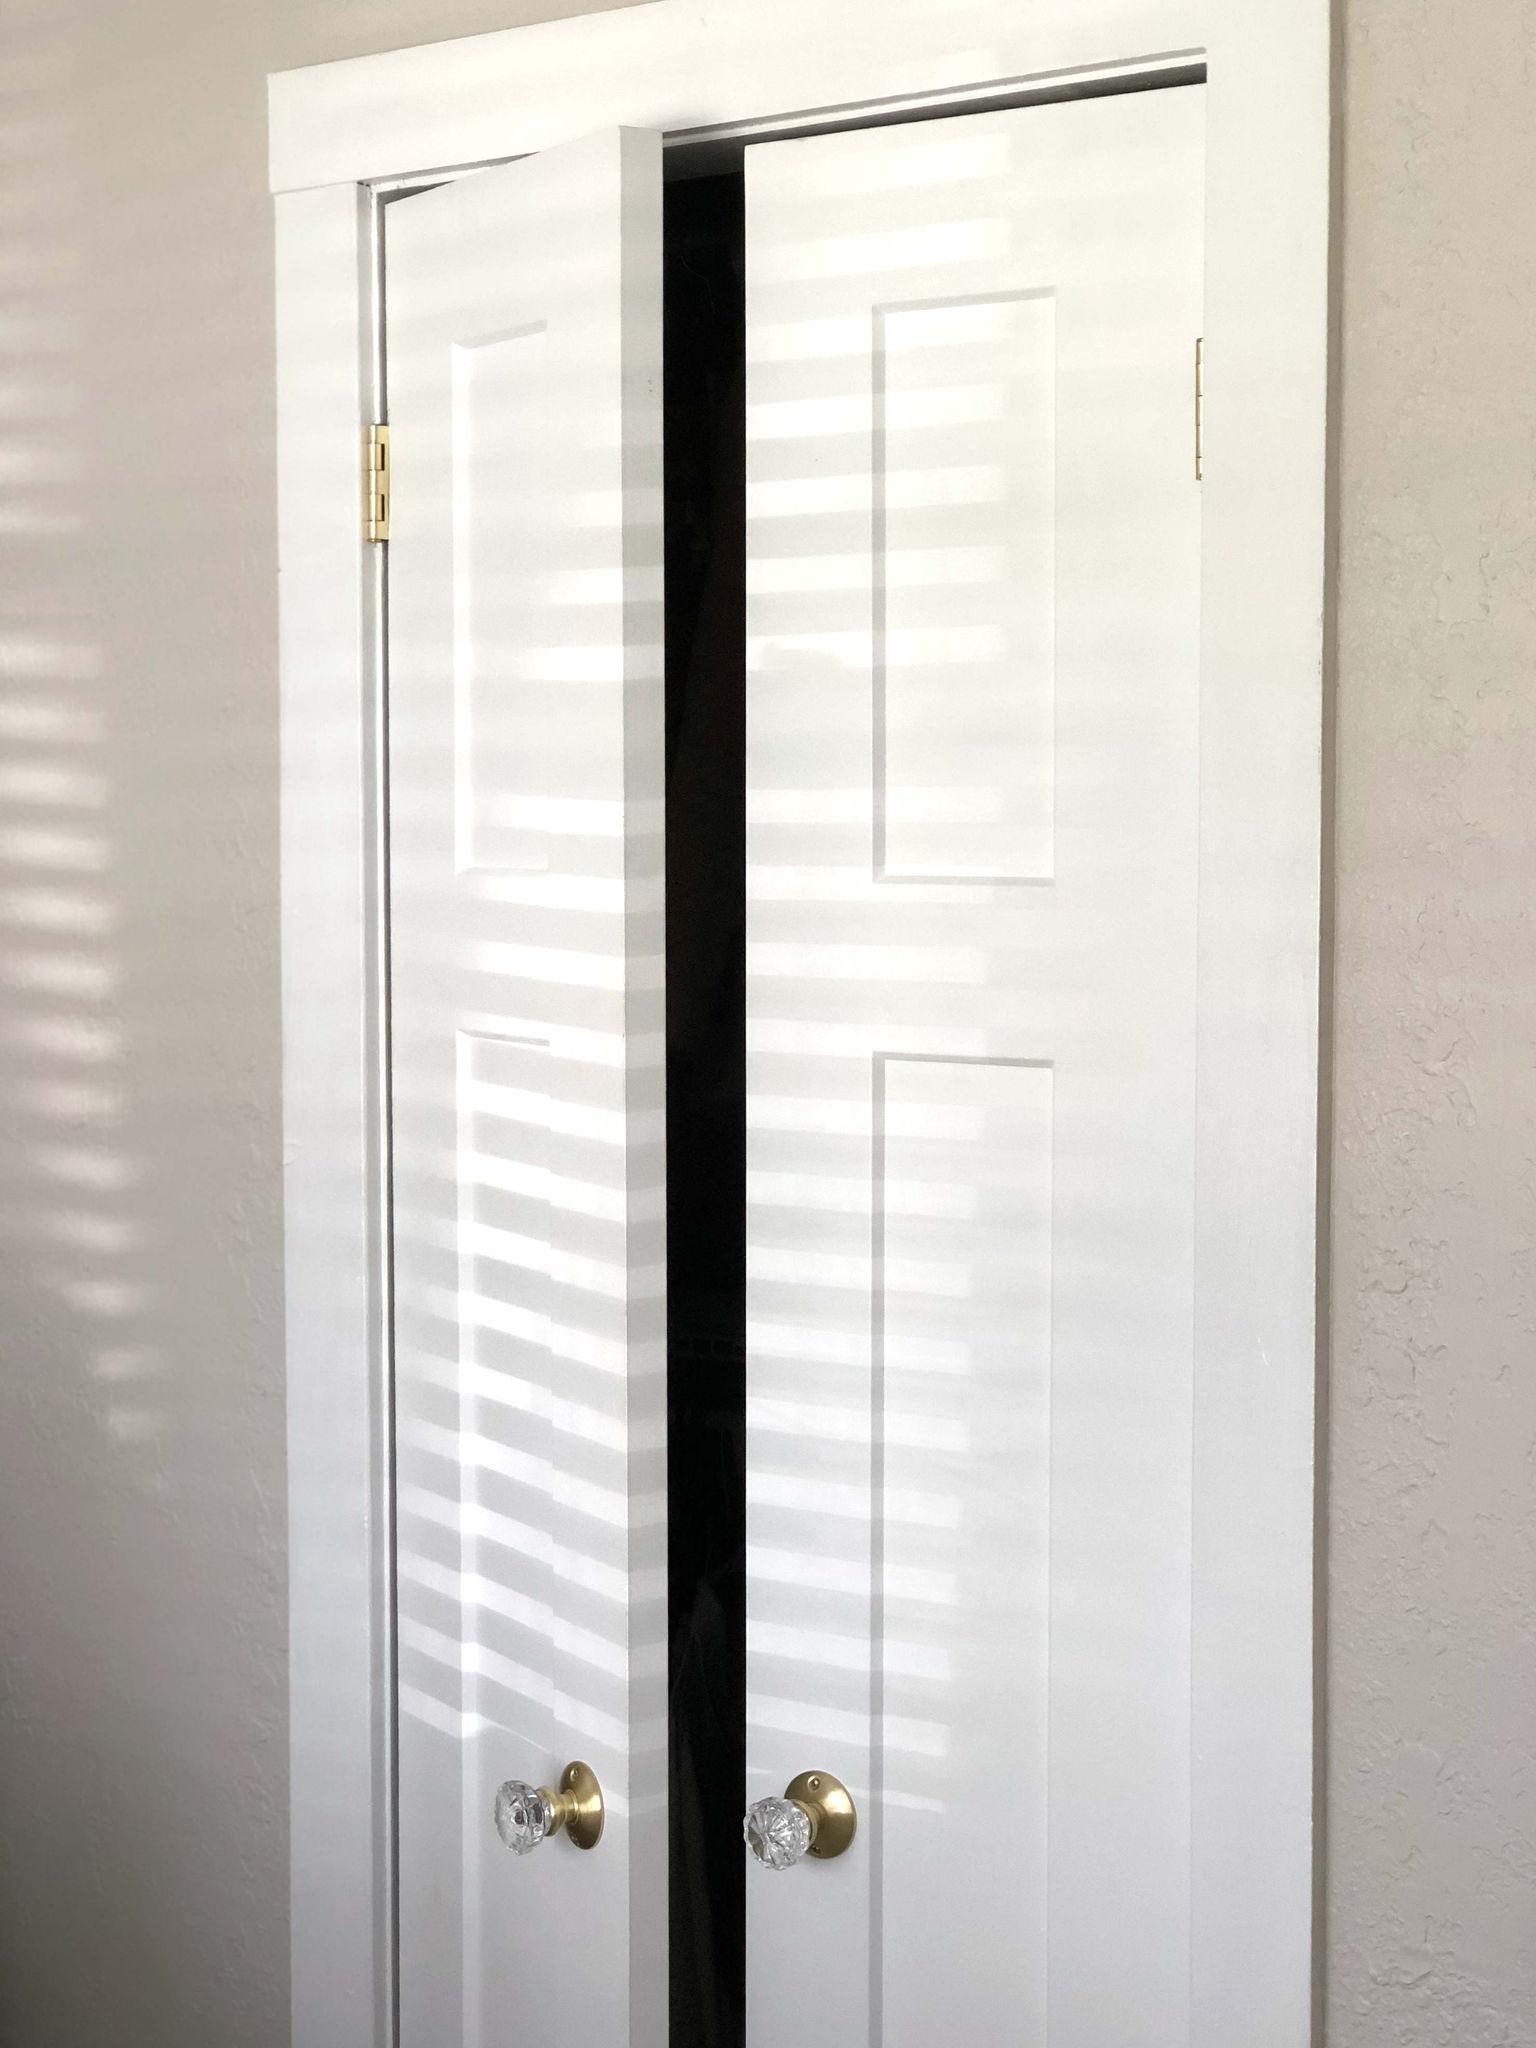 How To Bi Fold Doors Into French Doors